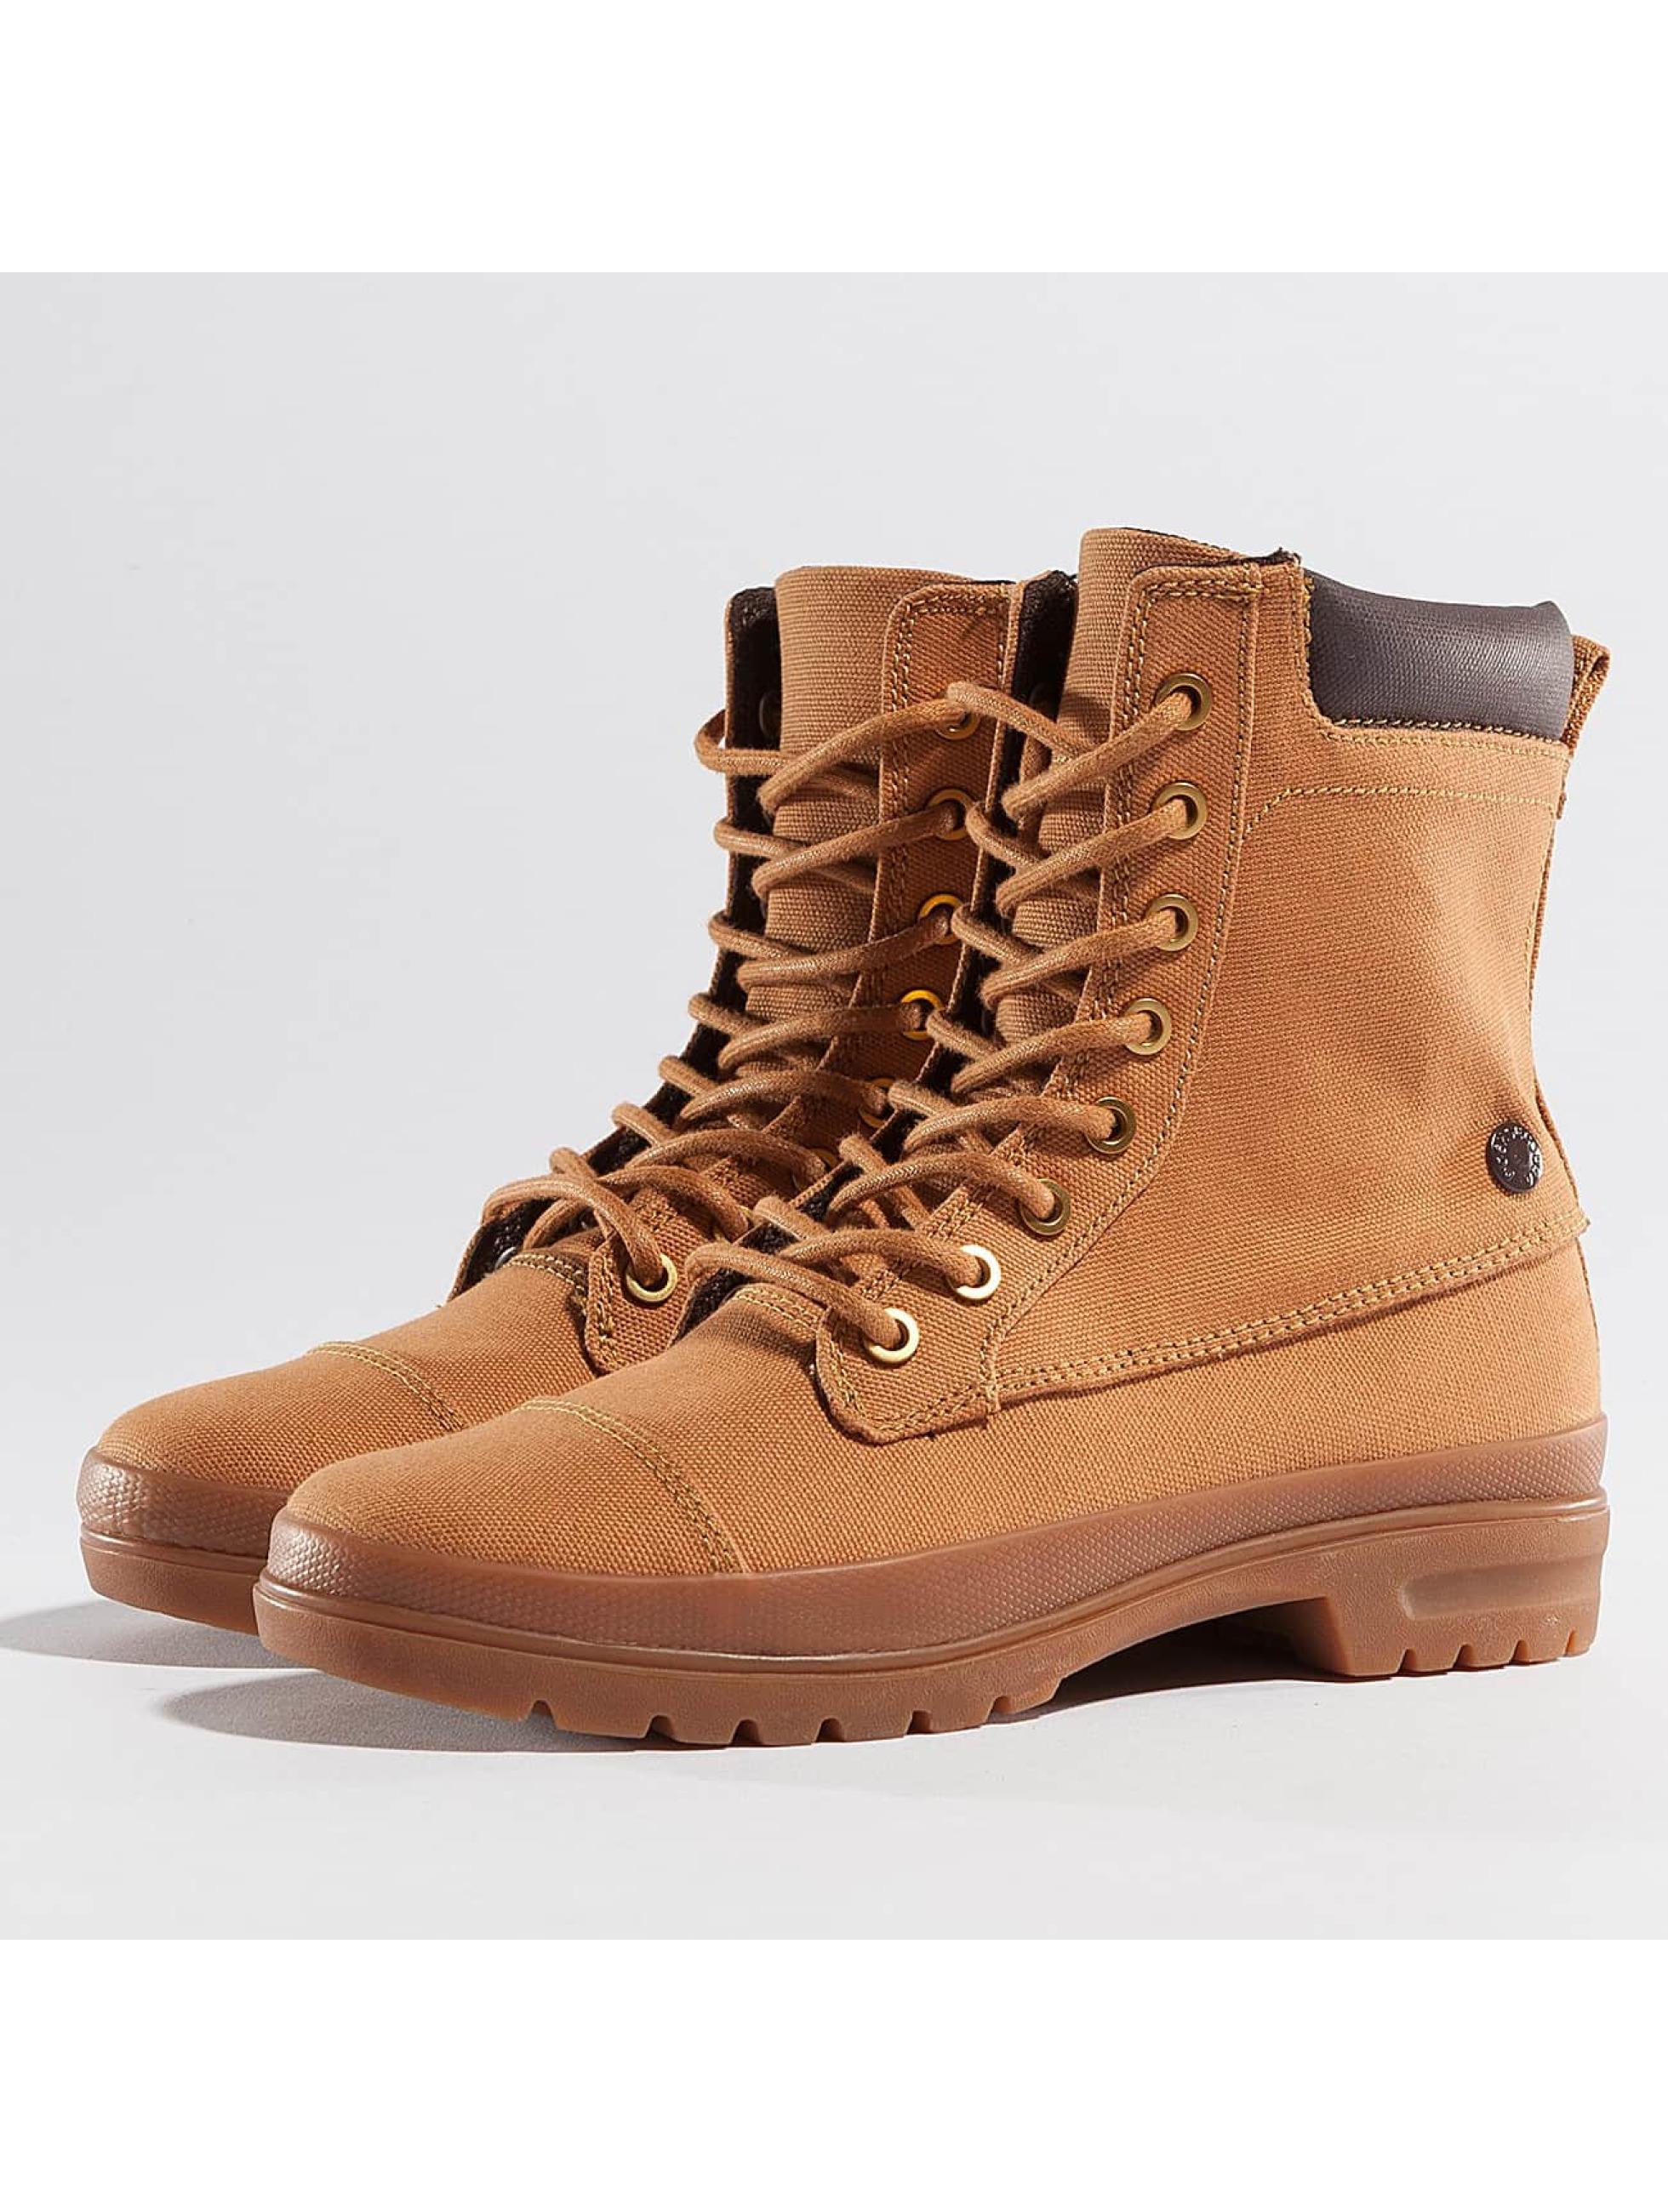 DC Frauen Boots Amnesti TX in braun